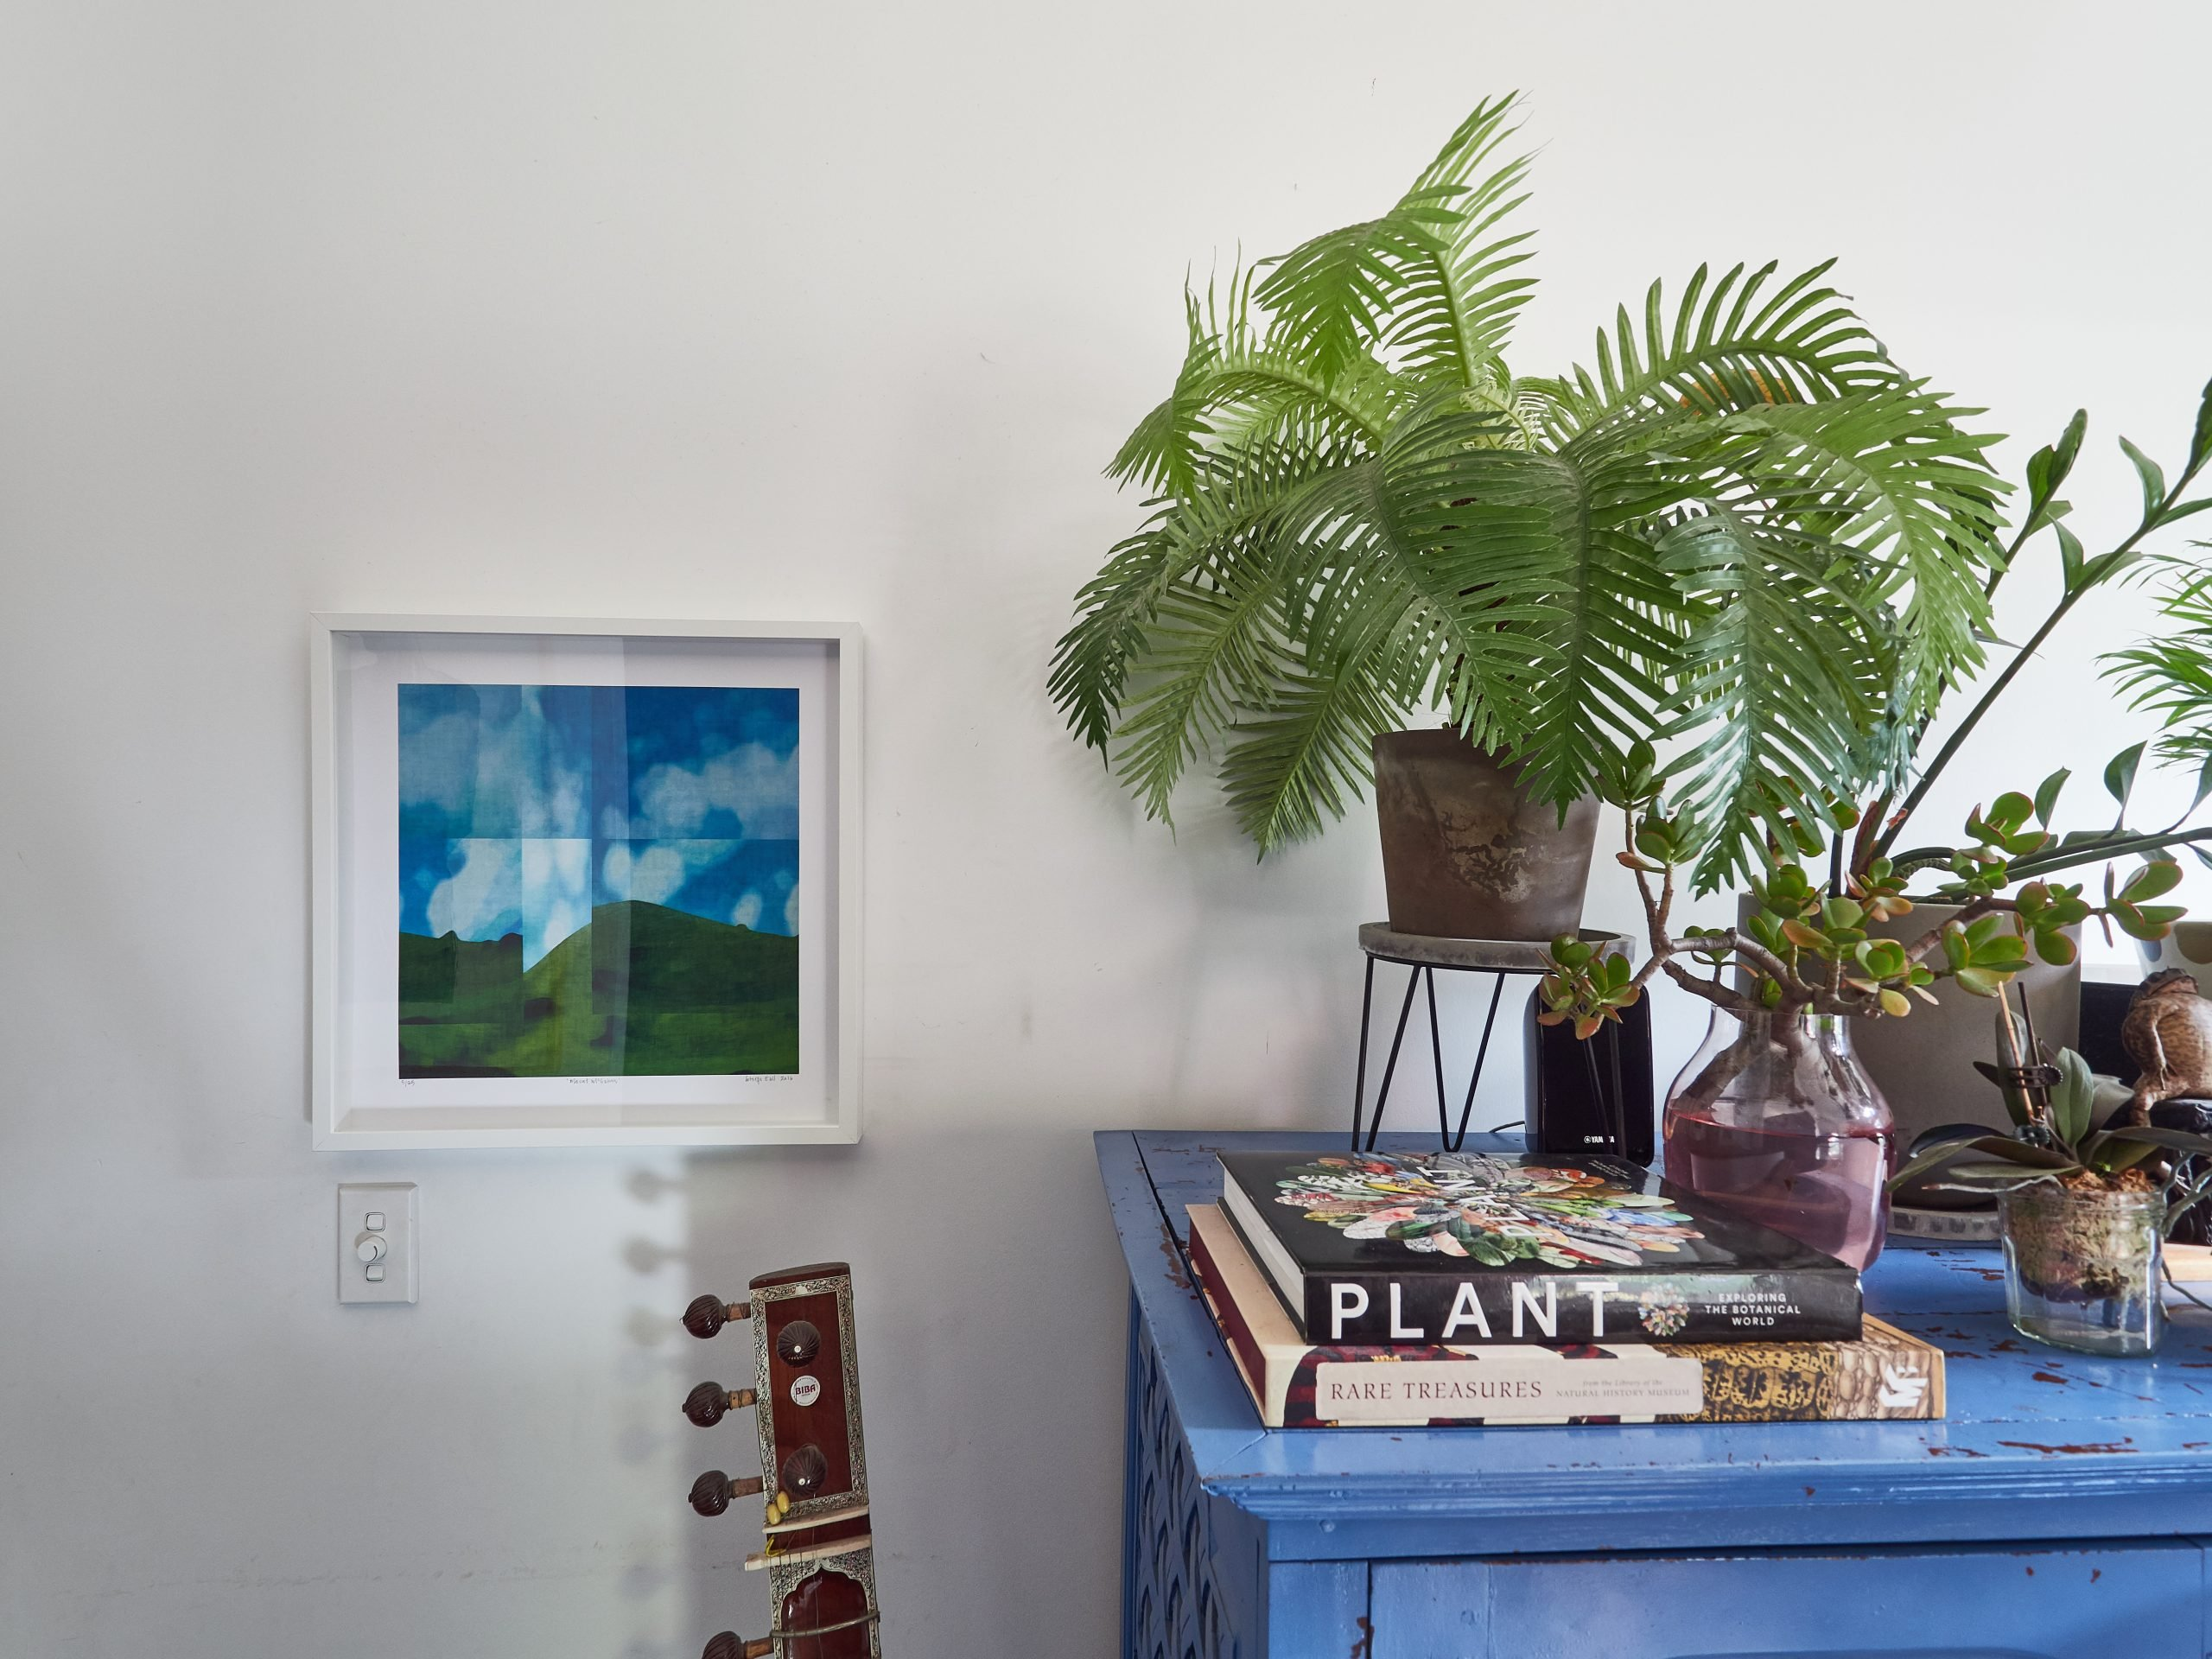 Artwork by George Hall hanging in Sally Browne's living room.